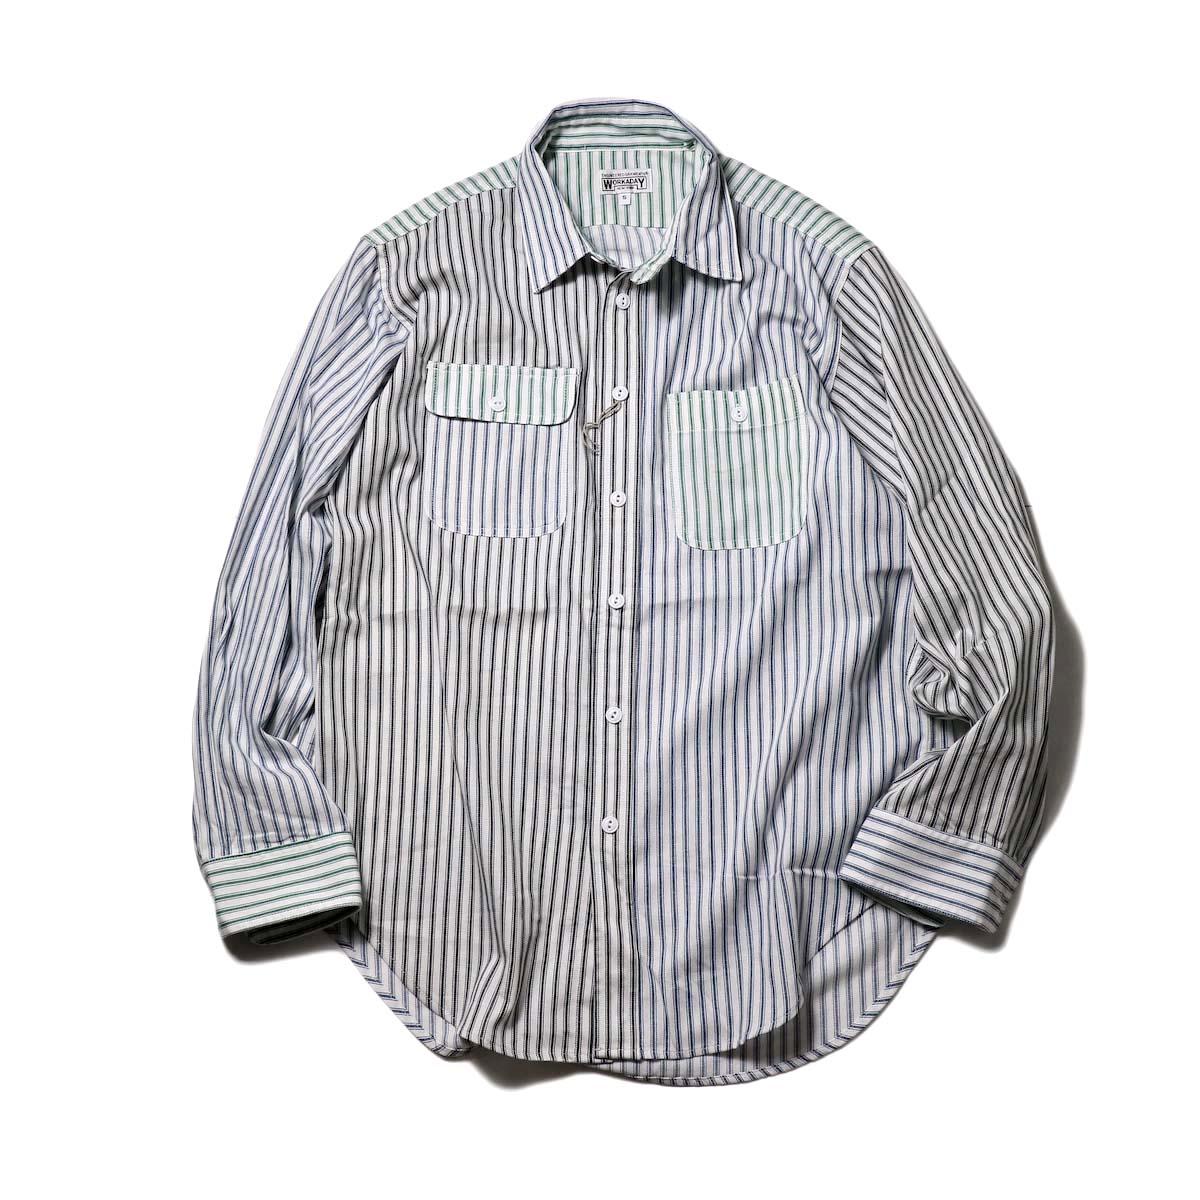 Engineered Garments Workaday / Utility Shirt Combo-Ticking St.(Blue/White)